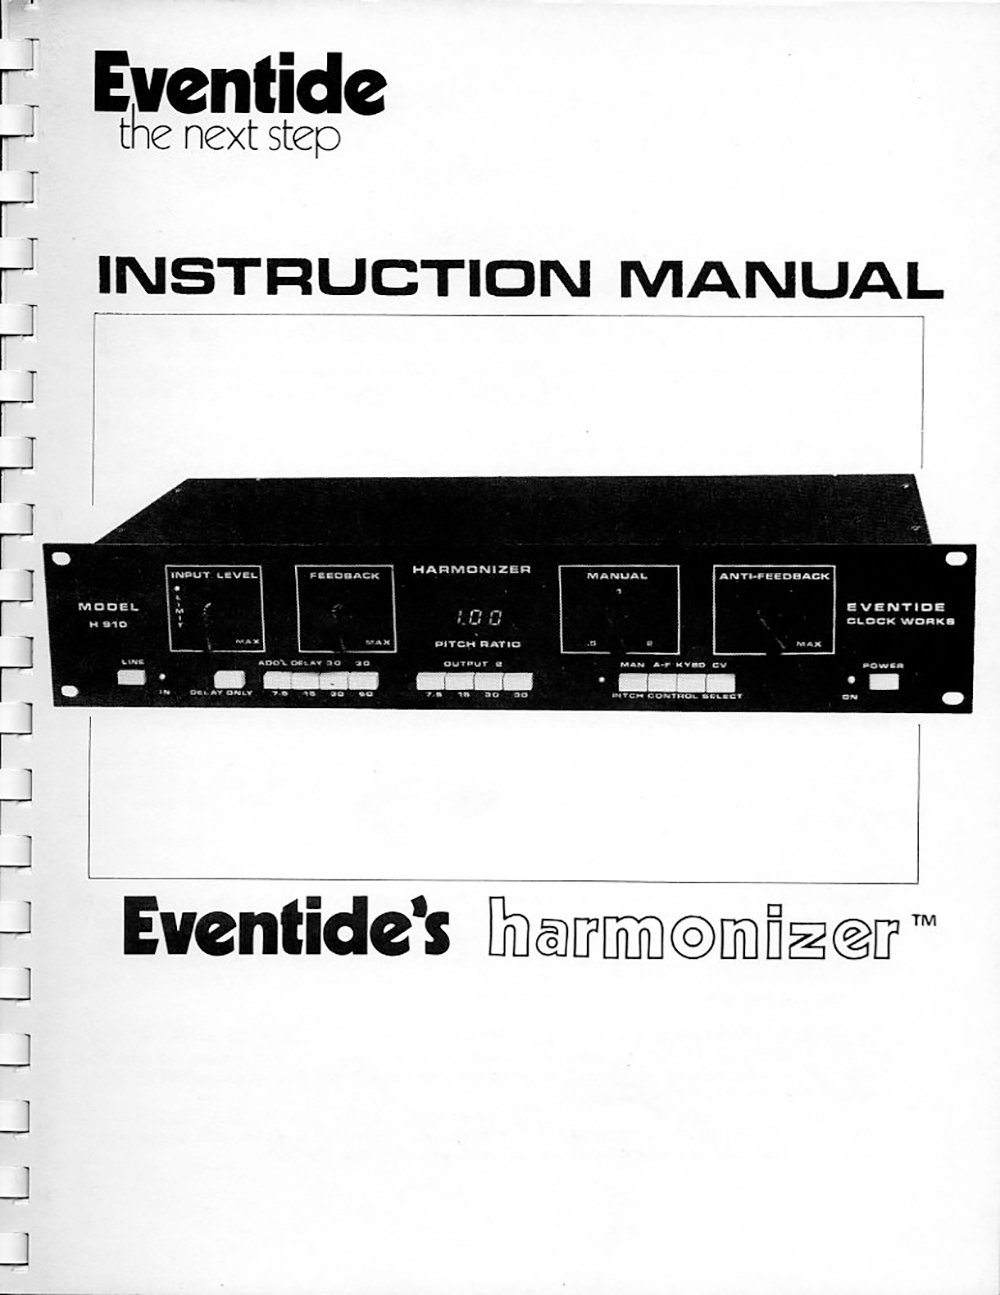 H910 Manual Cover